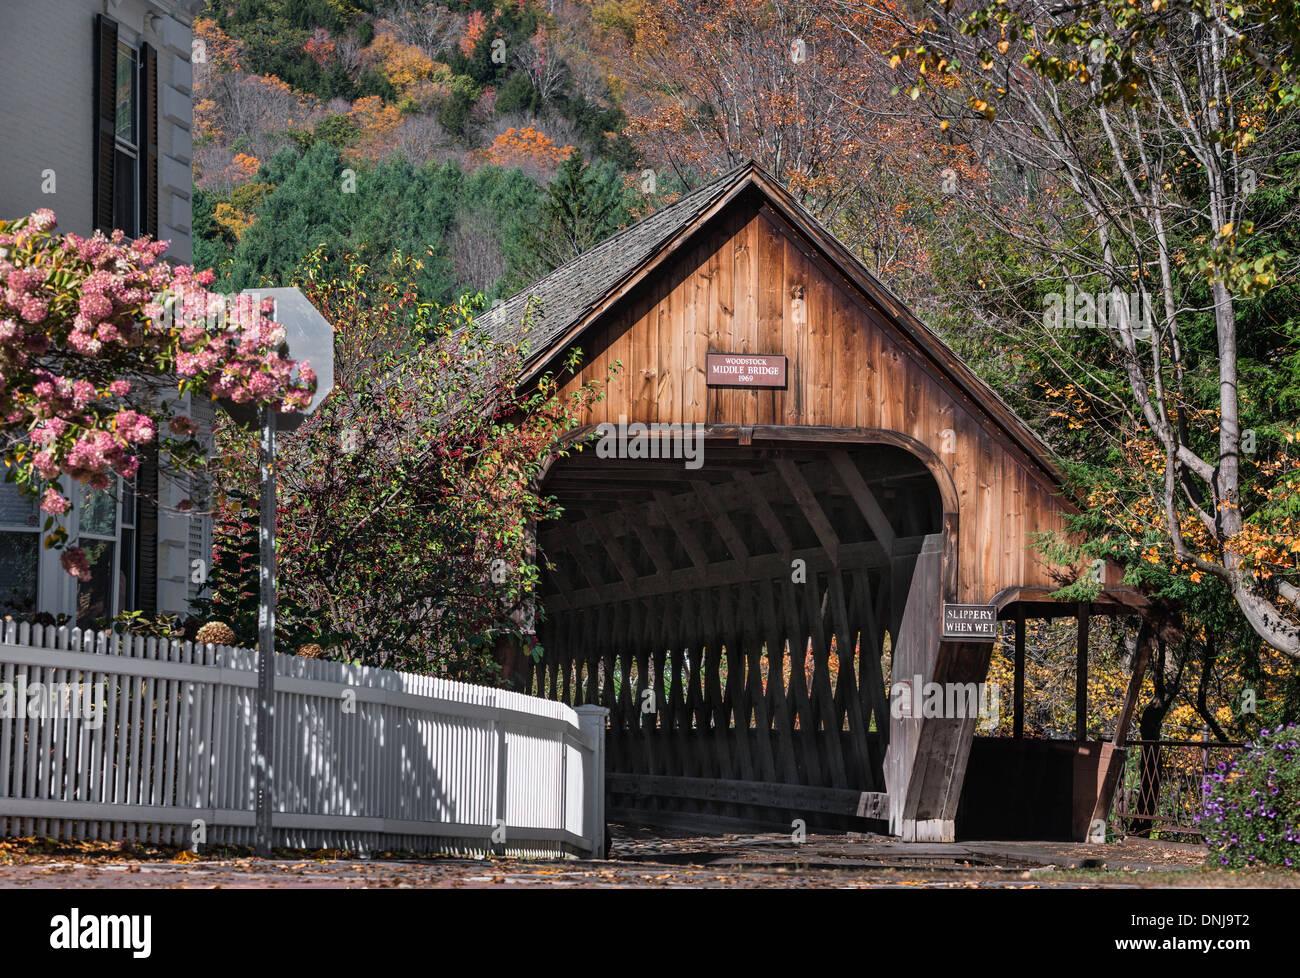 Puente cubierto, Medio Puente, Woodstock, Vermont, EE.UU. Imagen De Stock